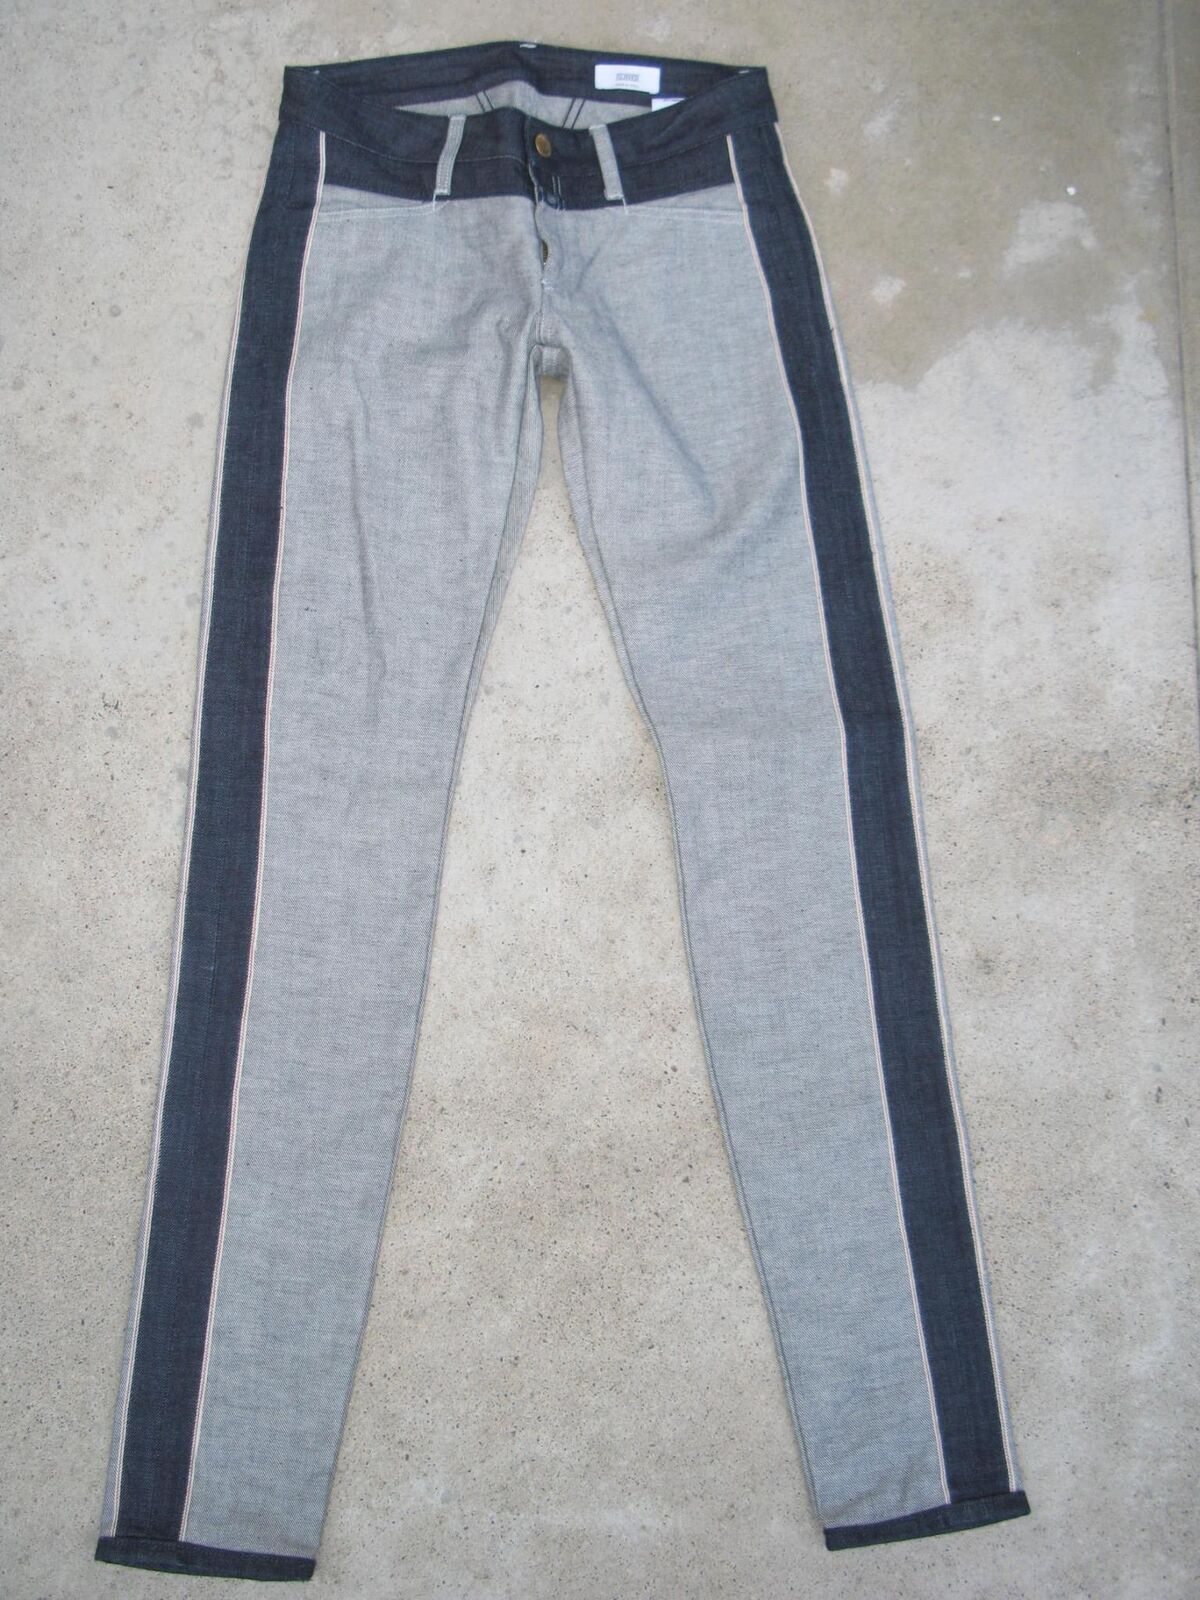 Closed Italiana Donna Aderente Cimossa Jeans Taglie 27 Reverse Denim Nuovo